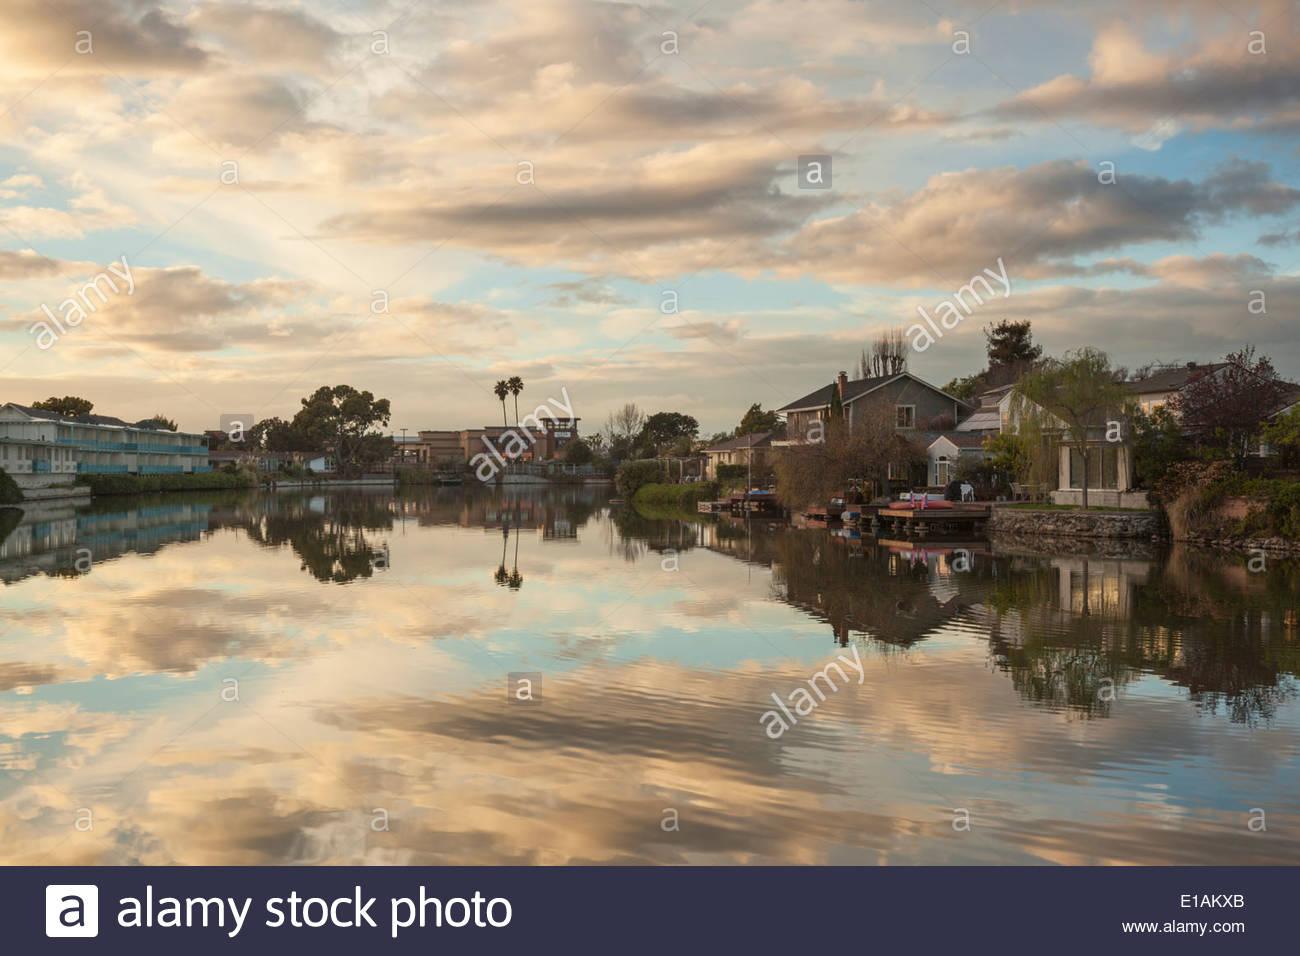 South Shore Lagoon, Alameda, California - Stock Image